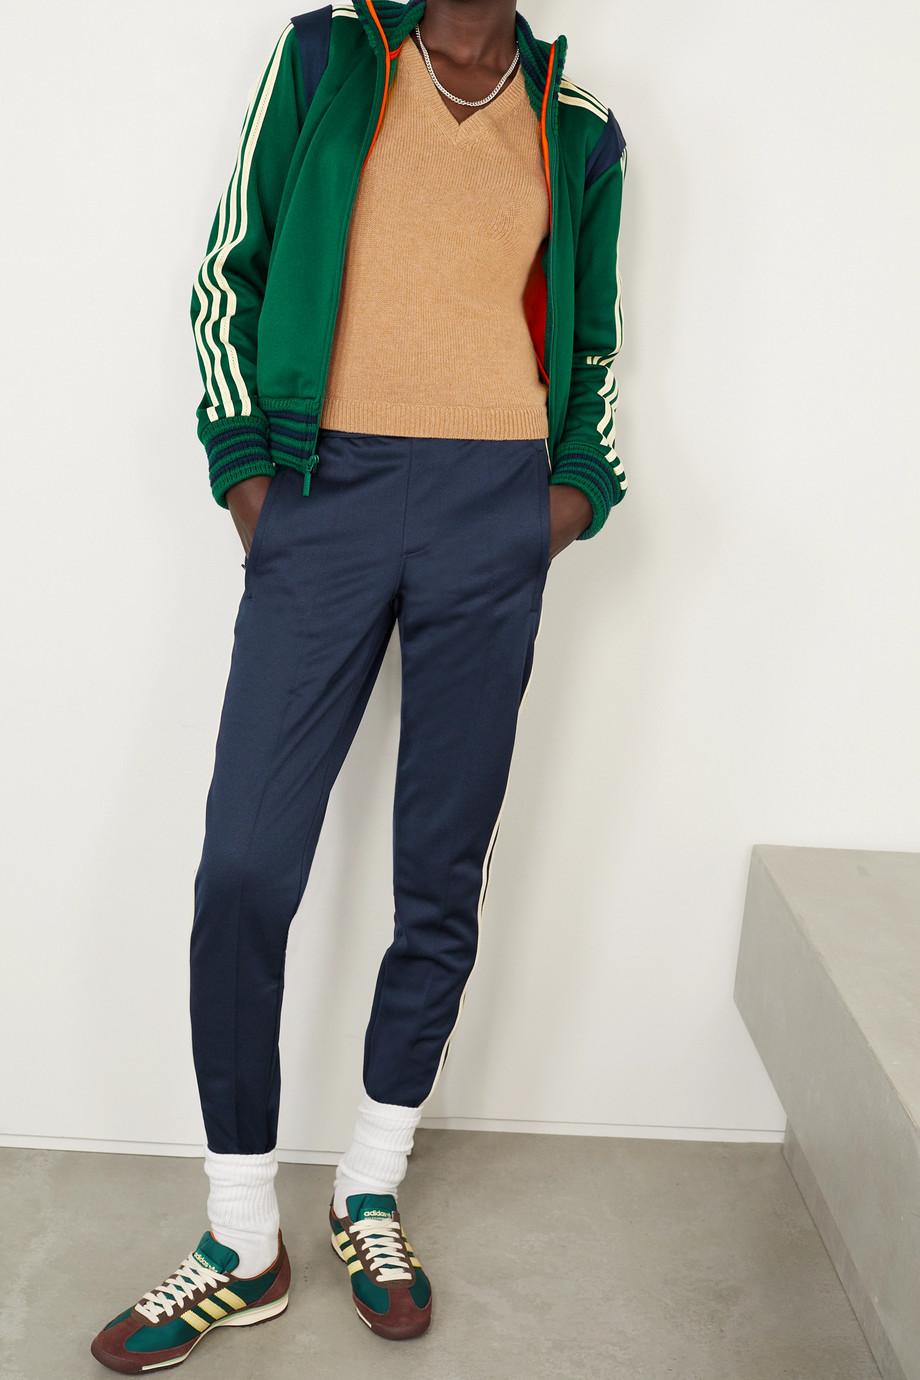 adidas Originals + Wales Bonner Lovers Rock crochet-trimmed tech-jersey slim-leg stirrup pants